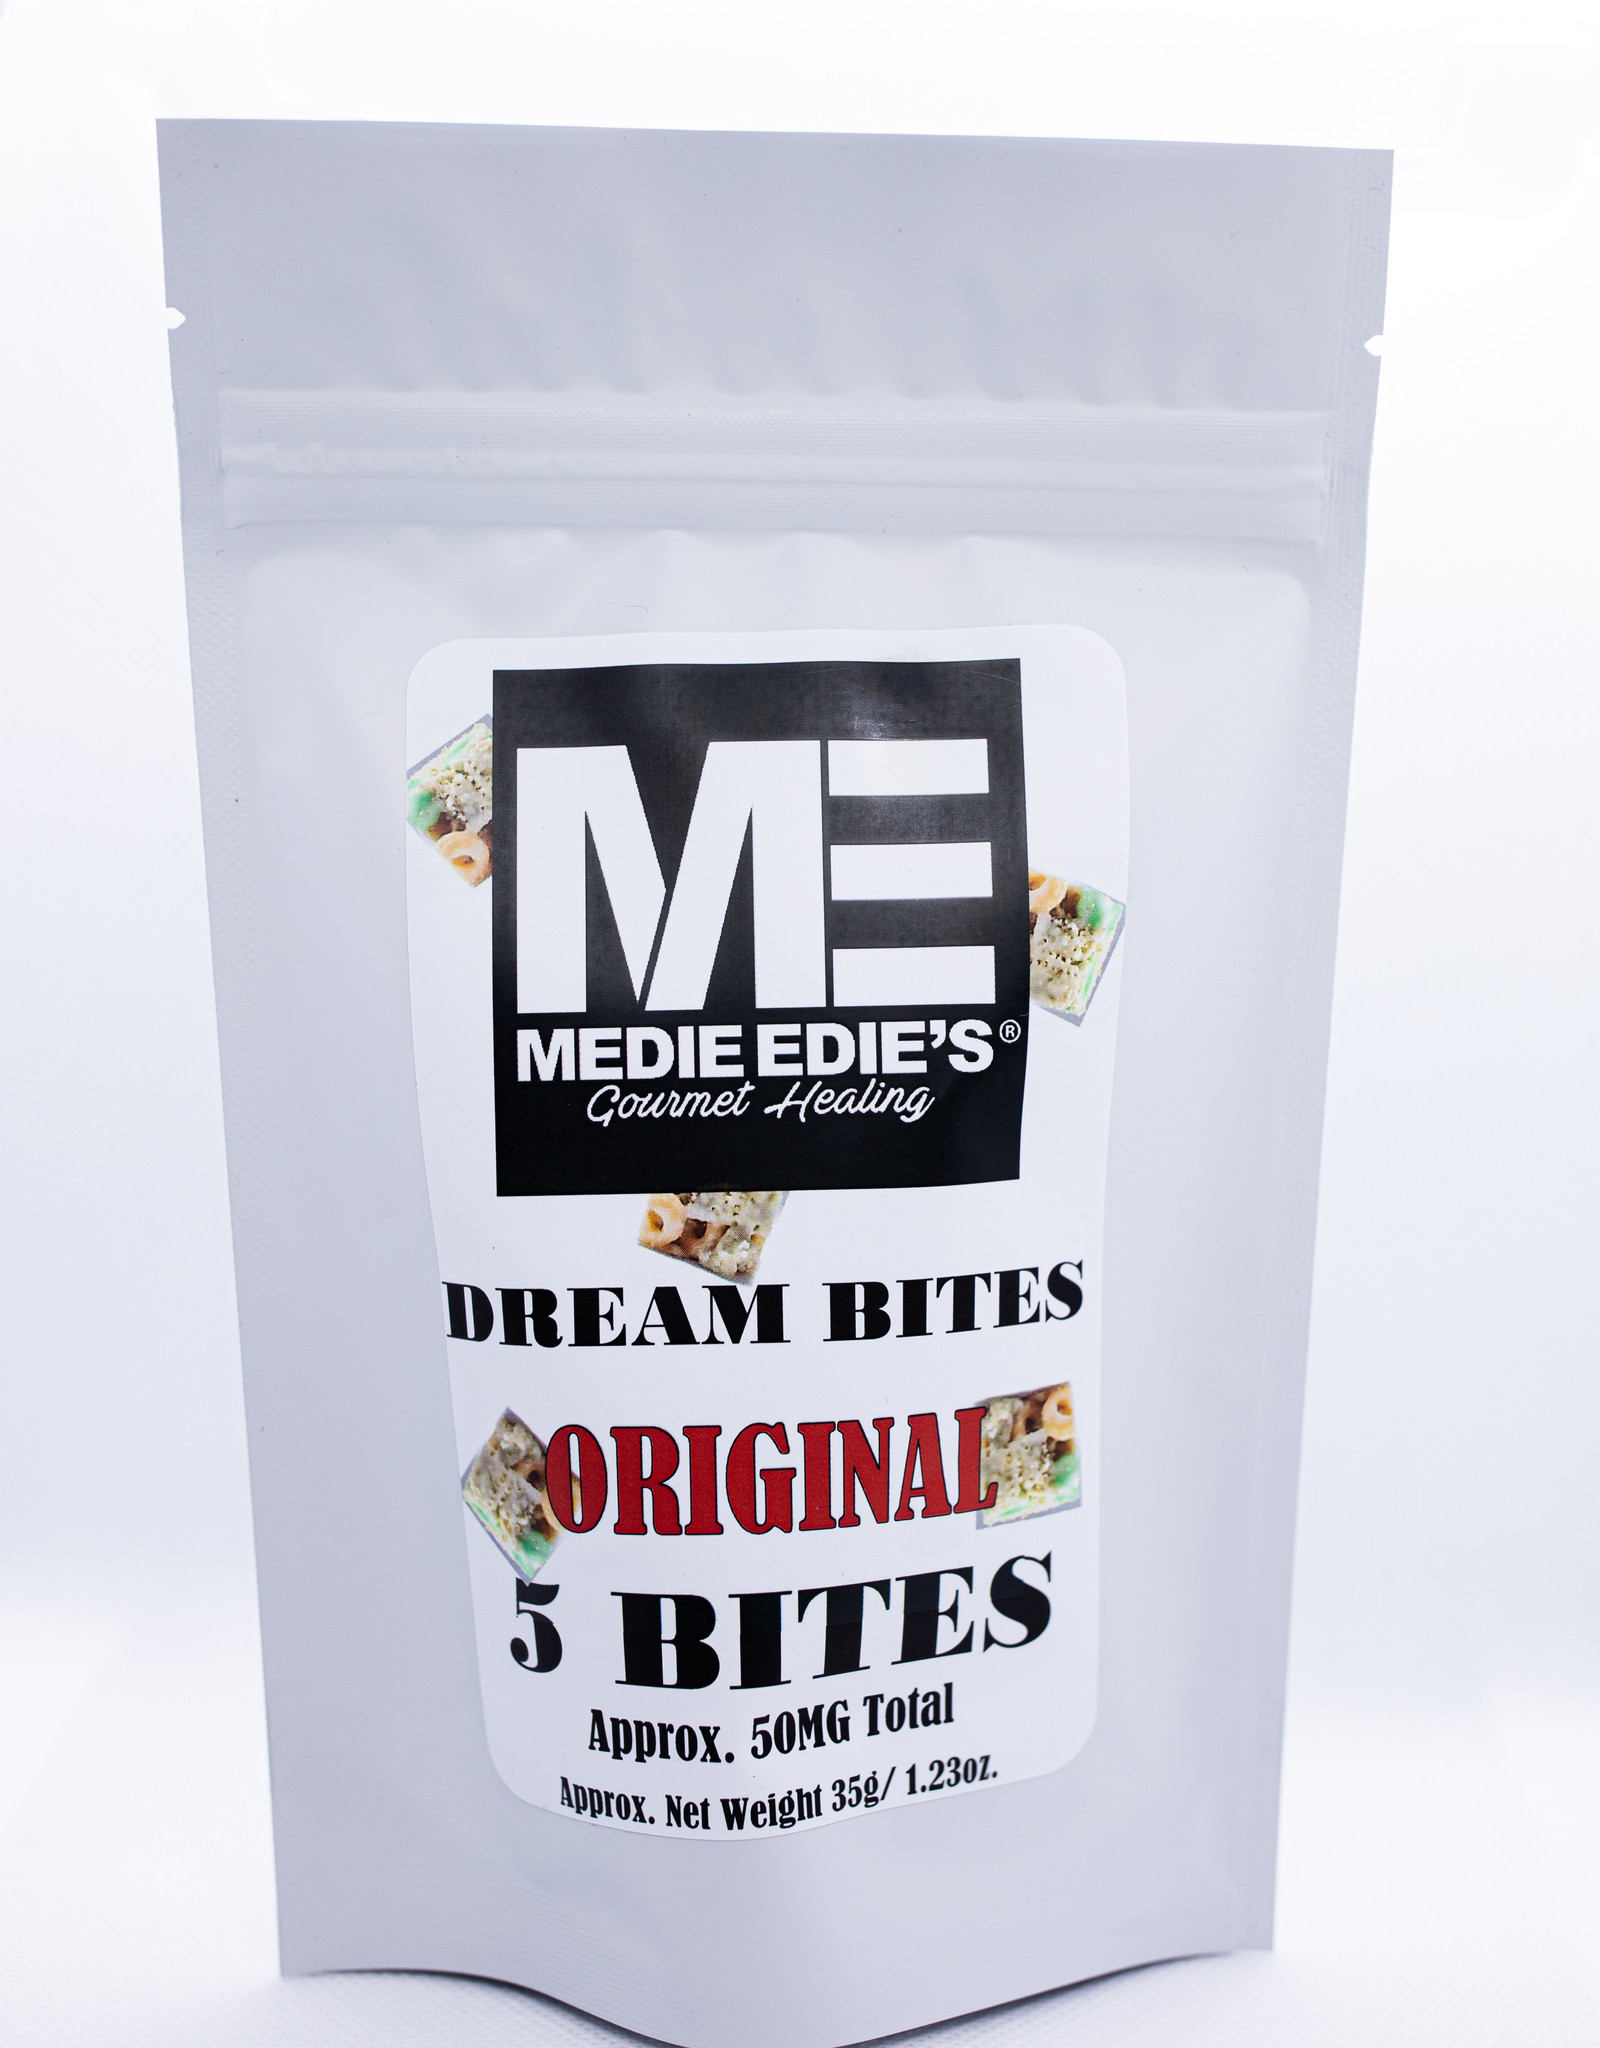 Medie Edie's Original CBD Dream Bites-5pc/10mg/50mg